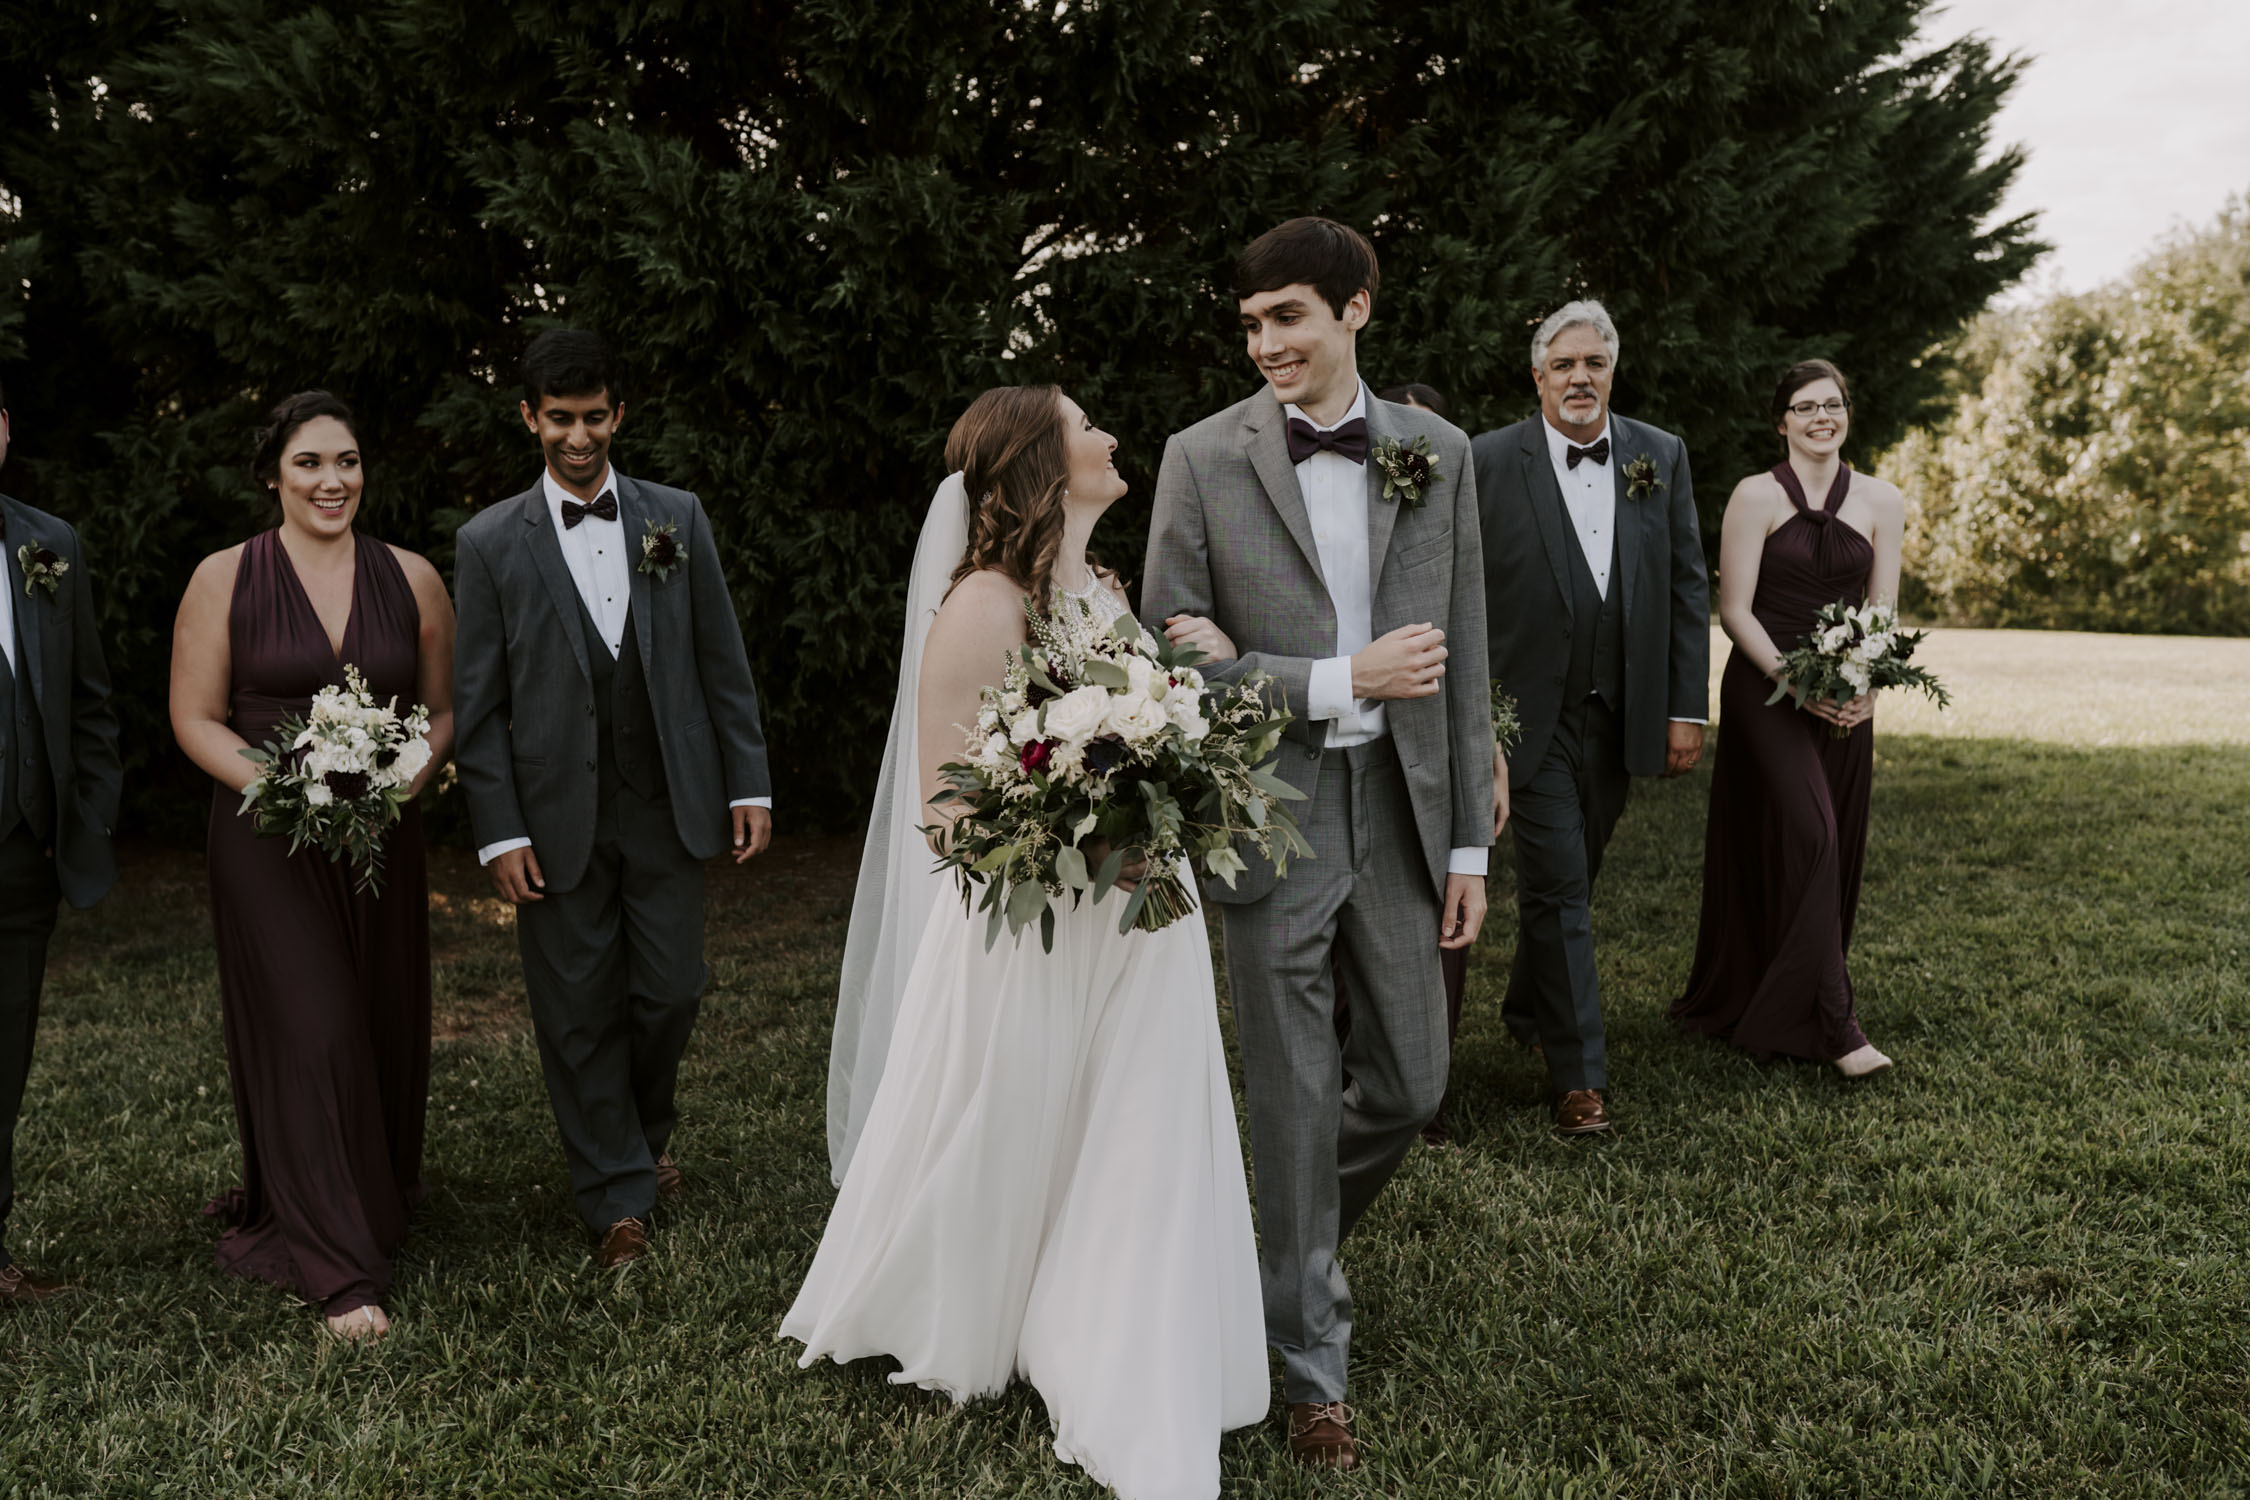 Chapel Hill Wedding Party Portraits | Kayli LaFon Photography, North Carolina Intimate Wedding Photographer